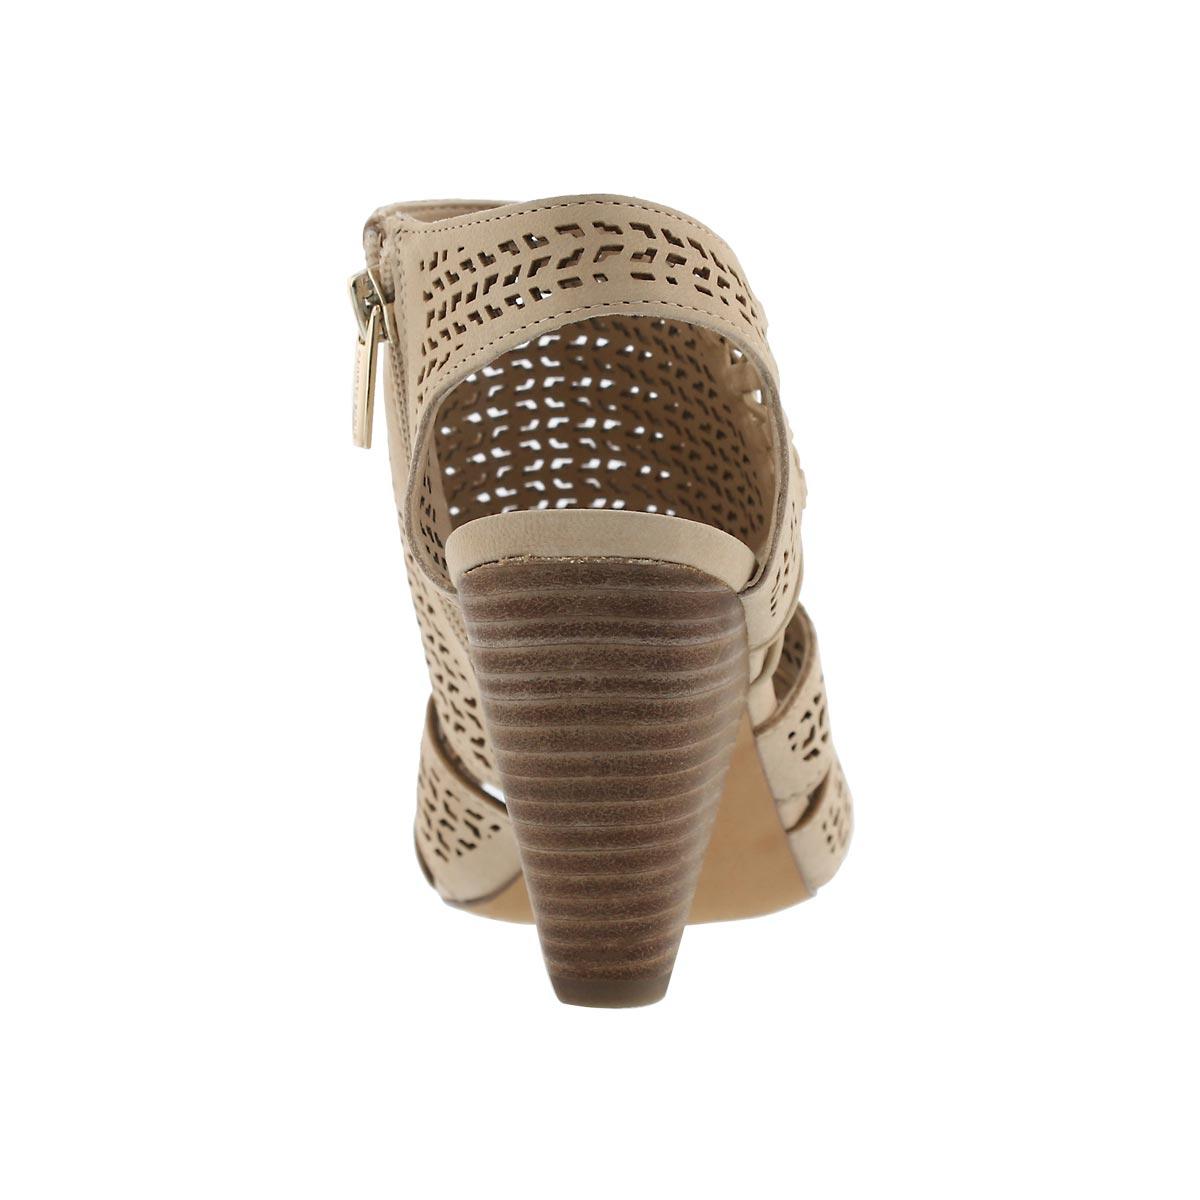 Lds Esten shell dress sandal